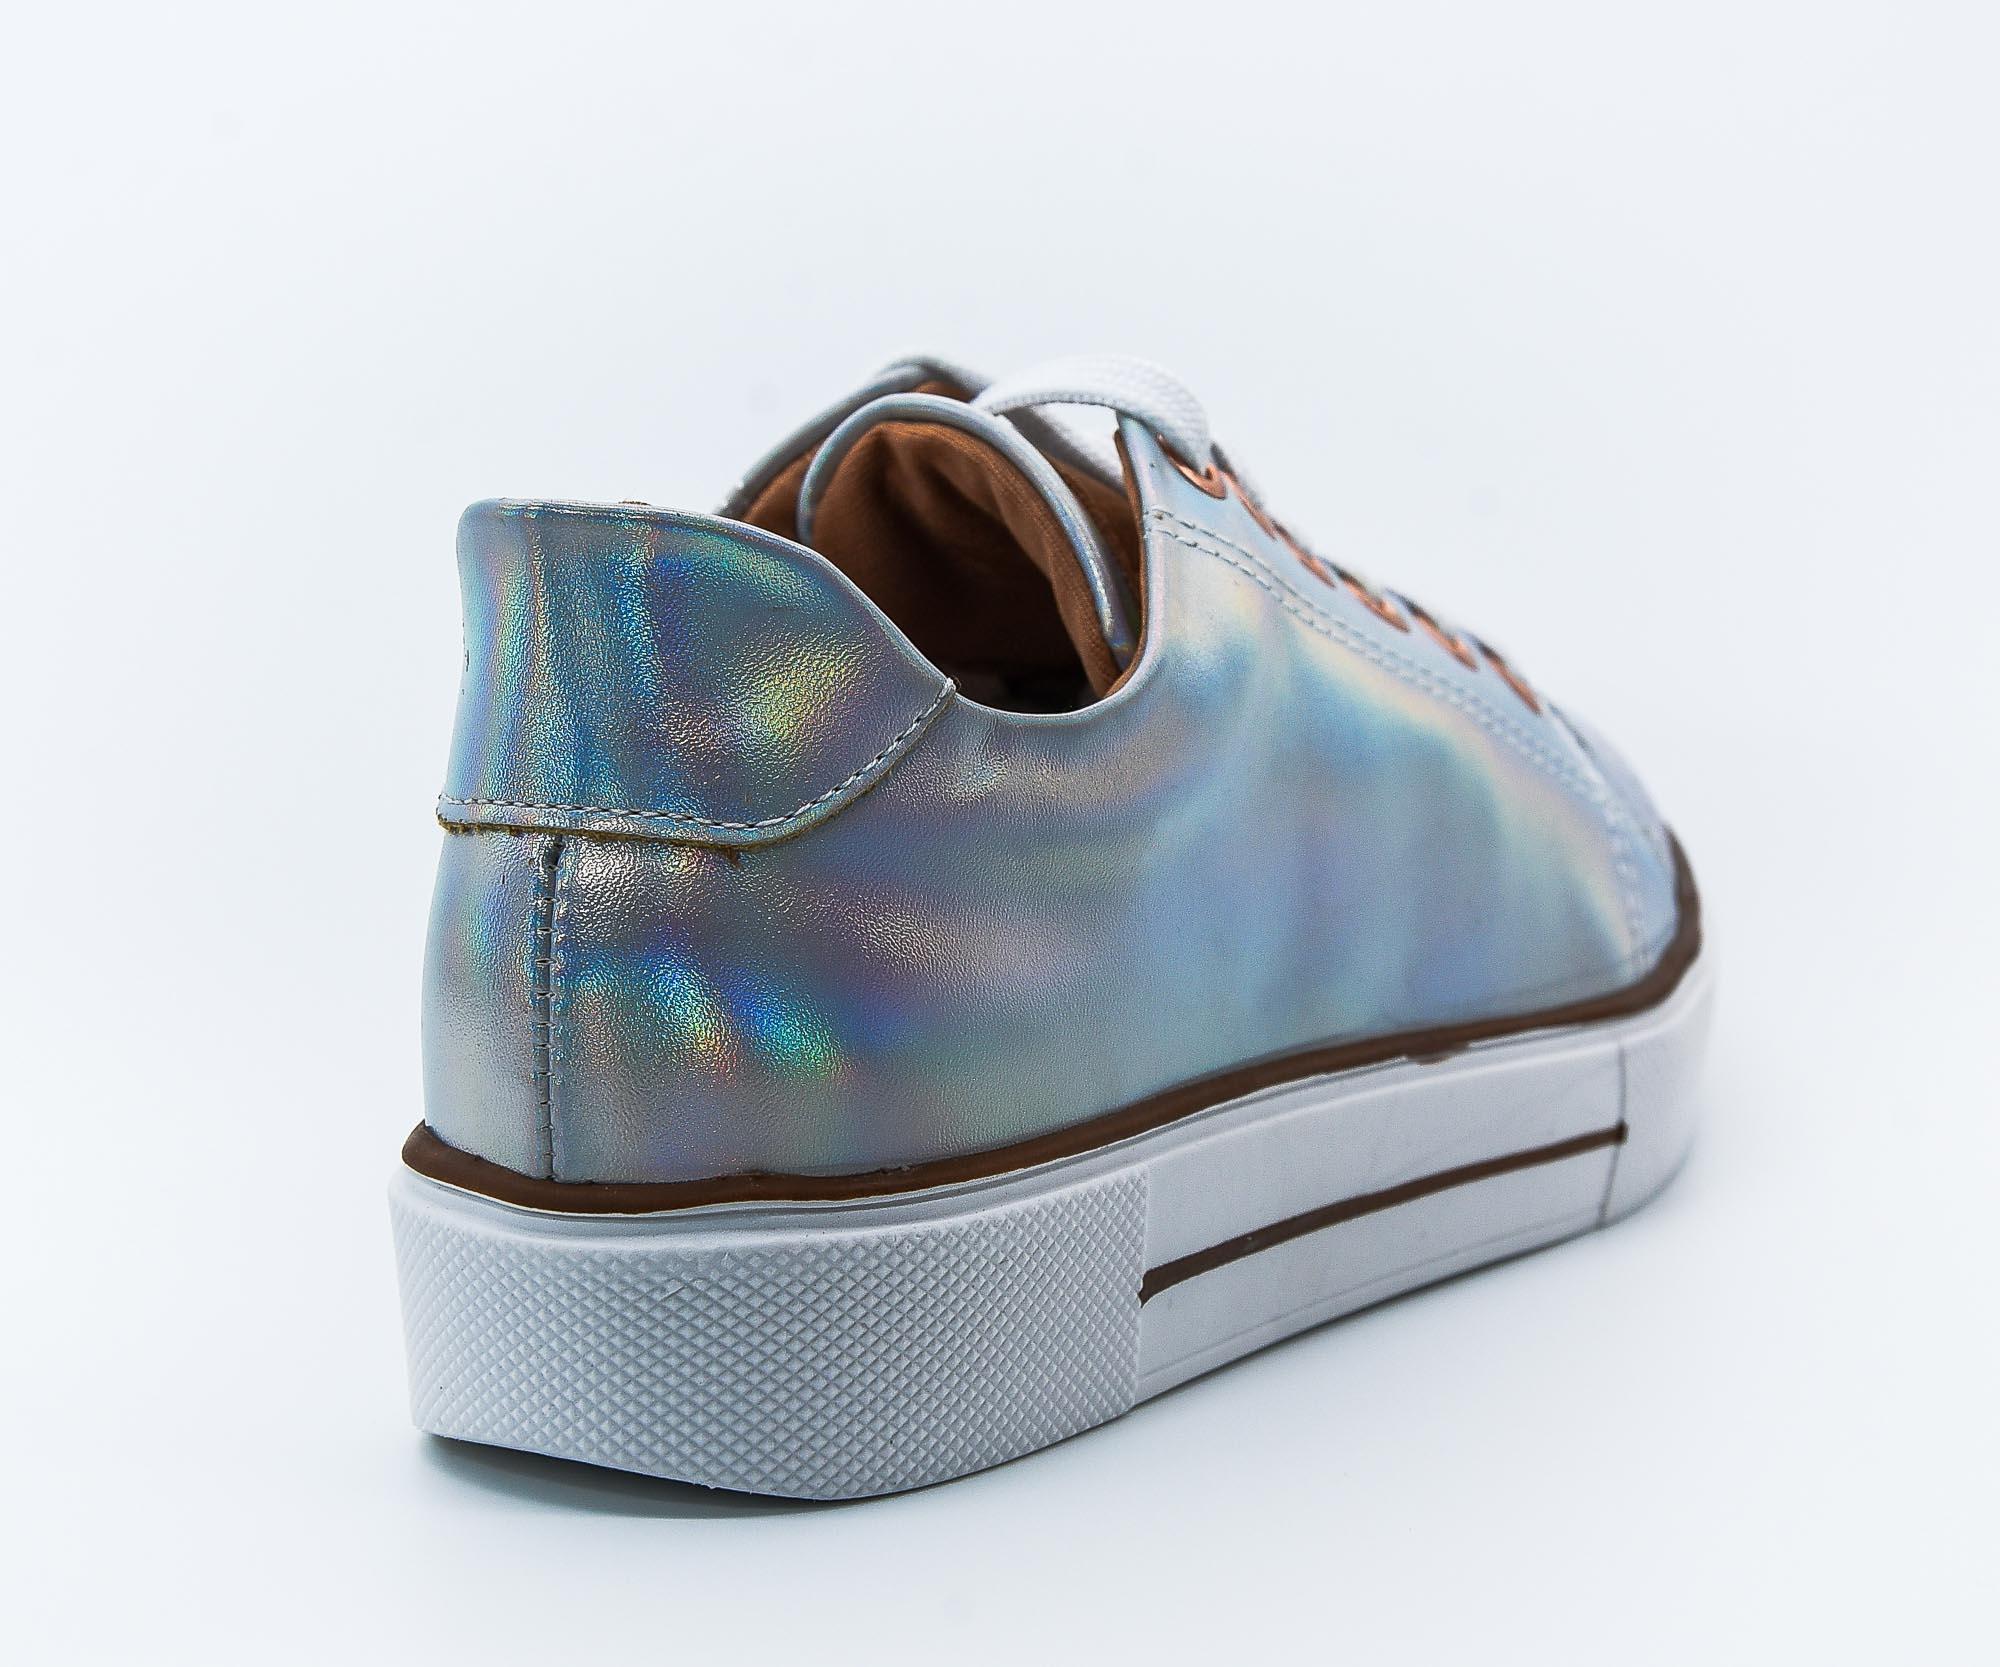 Tênis holográfico Bendito Sapato